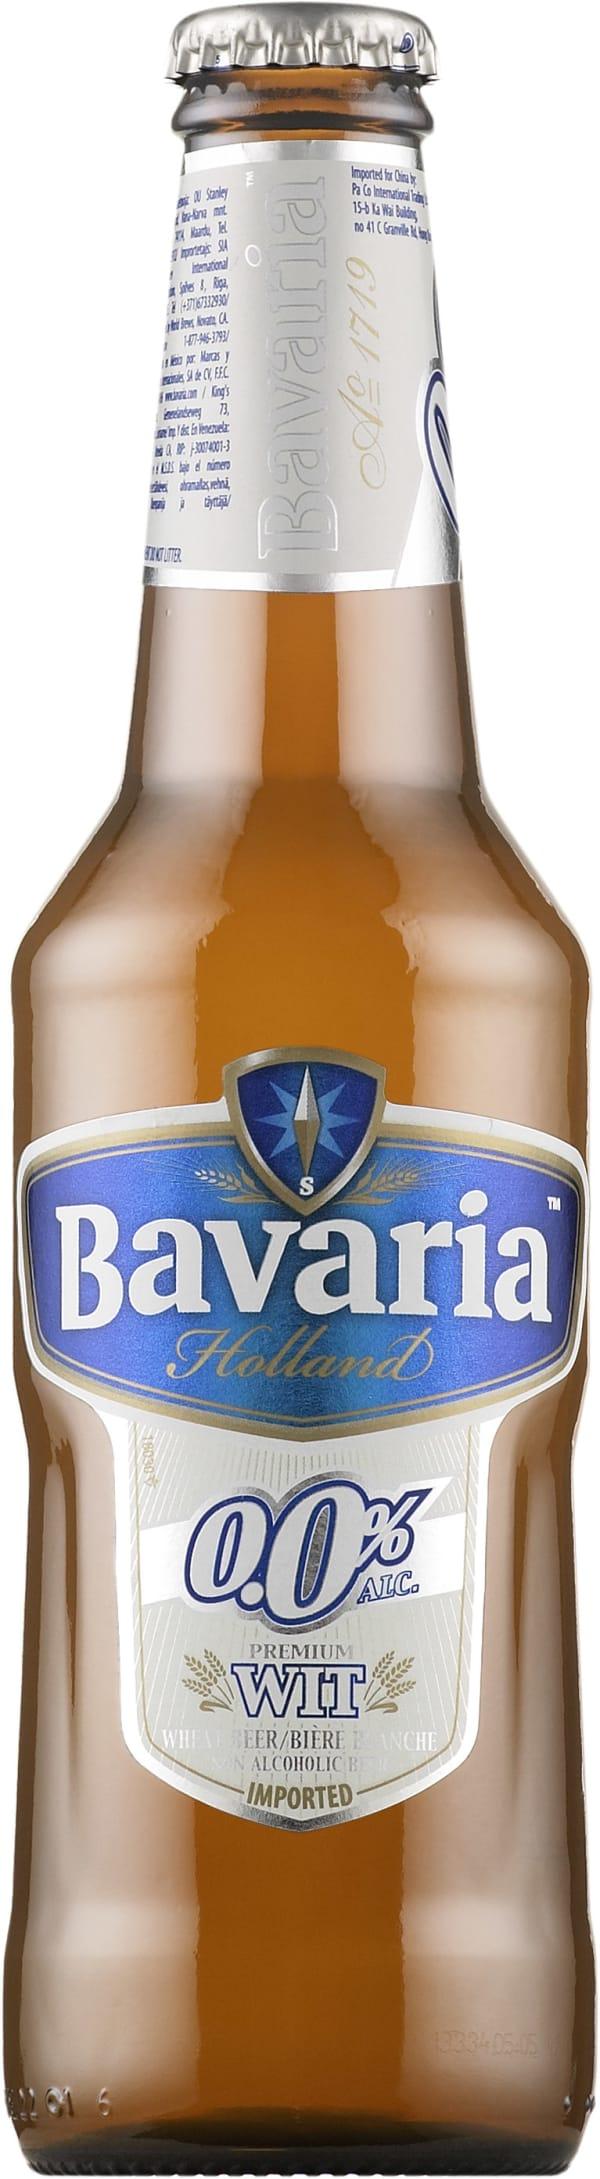 Bavaria Wit Non-alcoholic